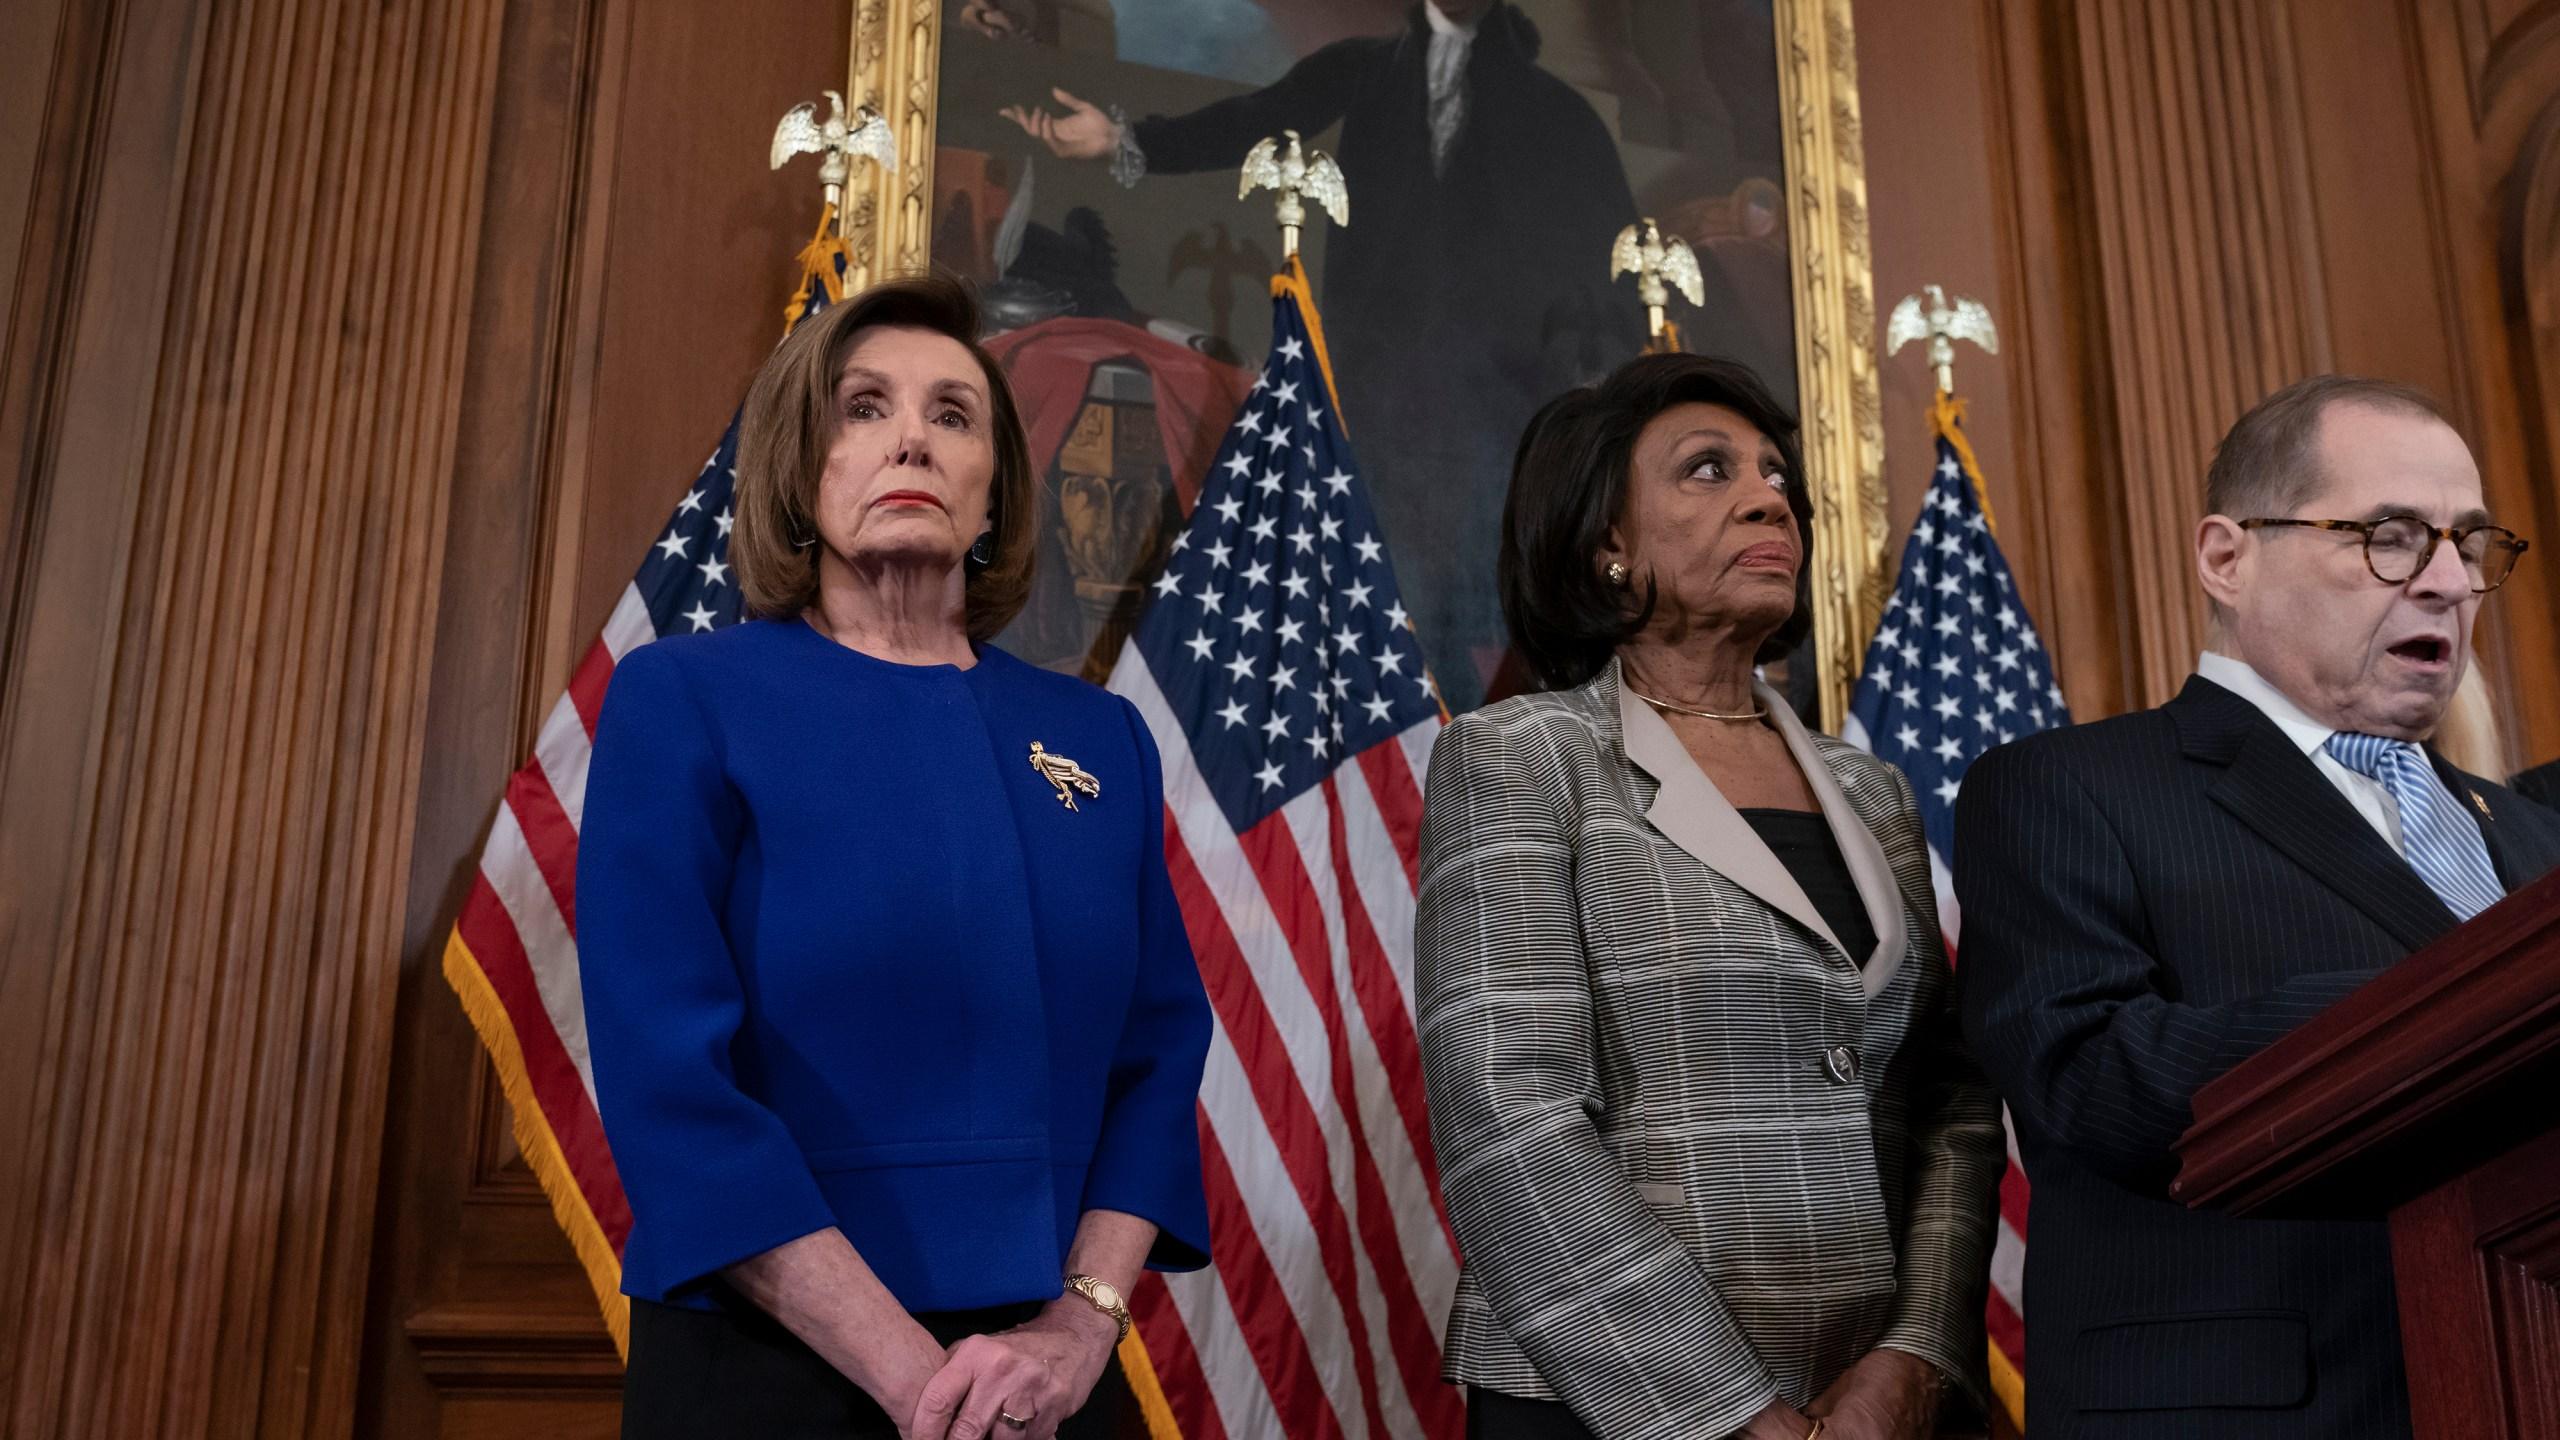 Nancy Pelosi, Jerrold Nadler, Maxine Waters